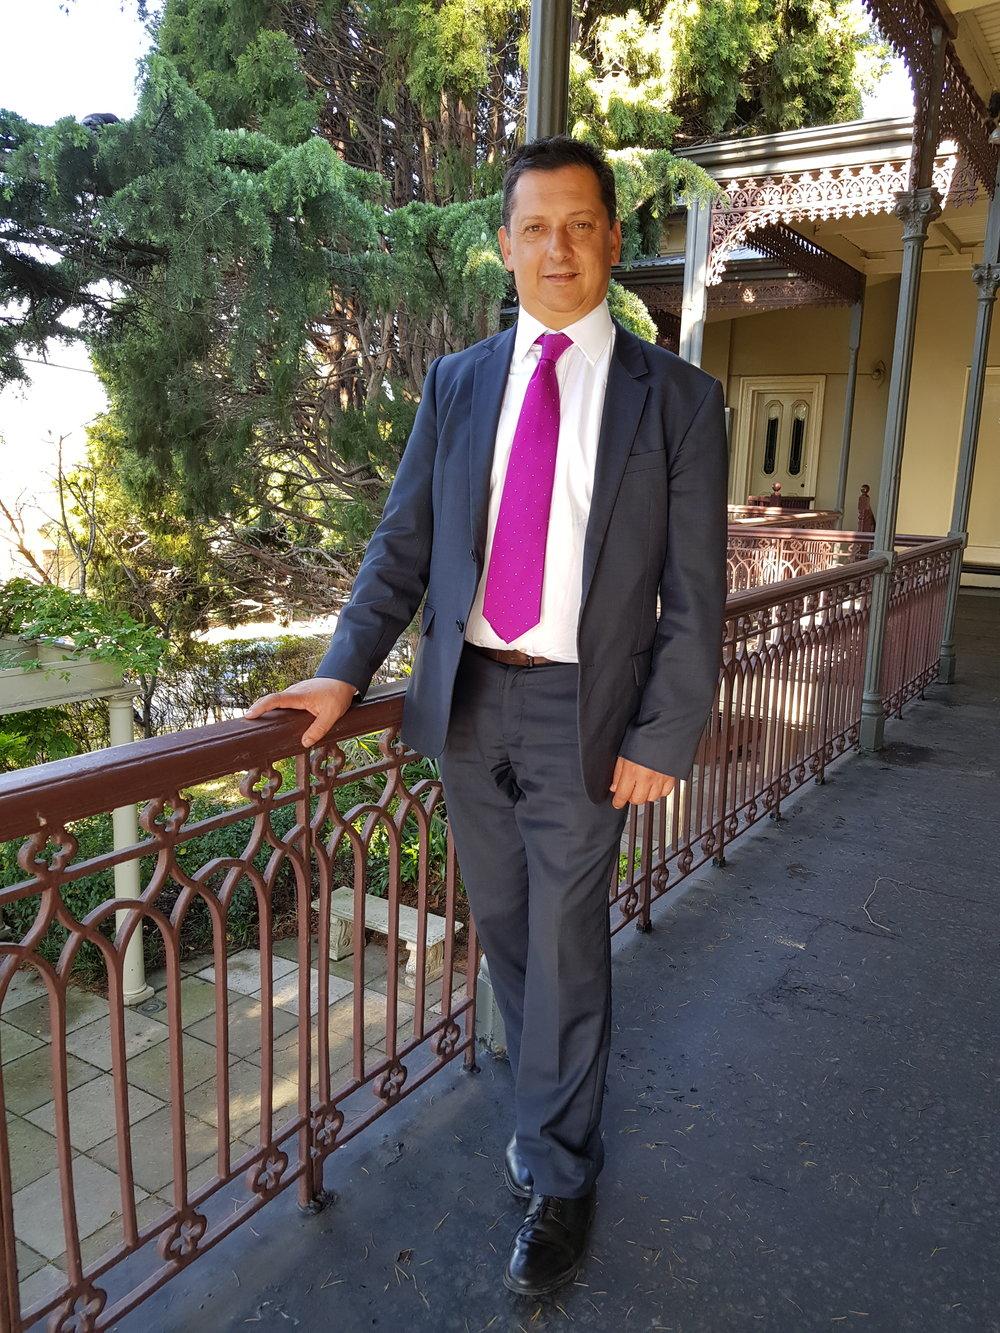 Alister Ondarchie - Adviser  EMAIL: a.ondarchie@ejm.com.au  MOBILE: 0412 560 233